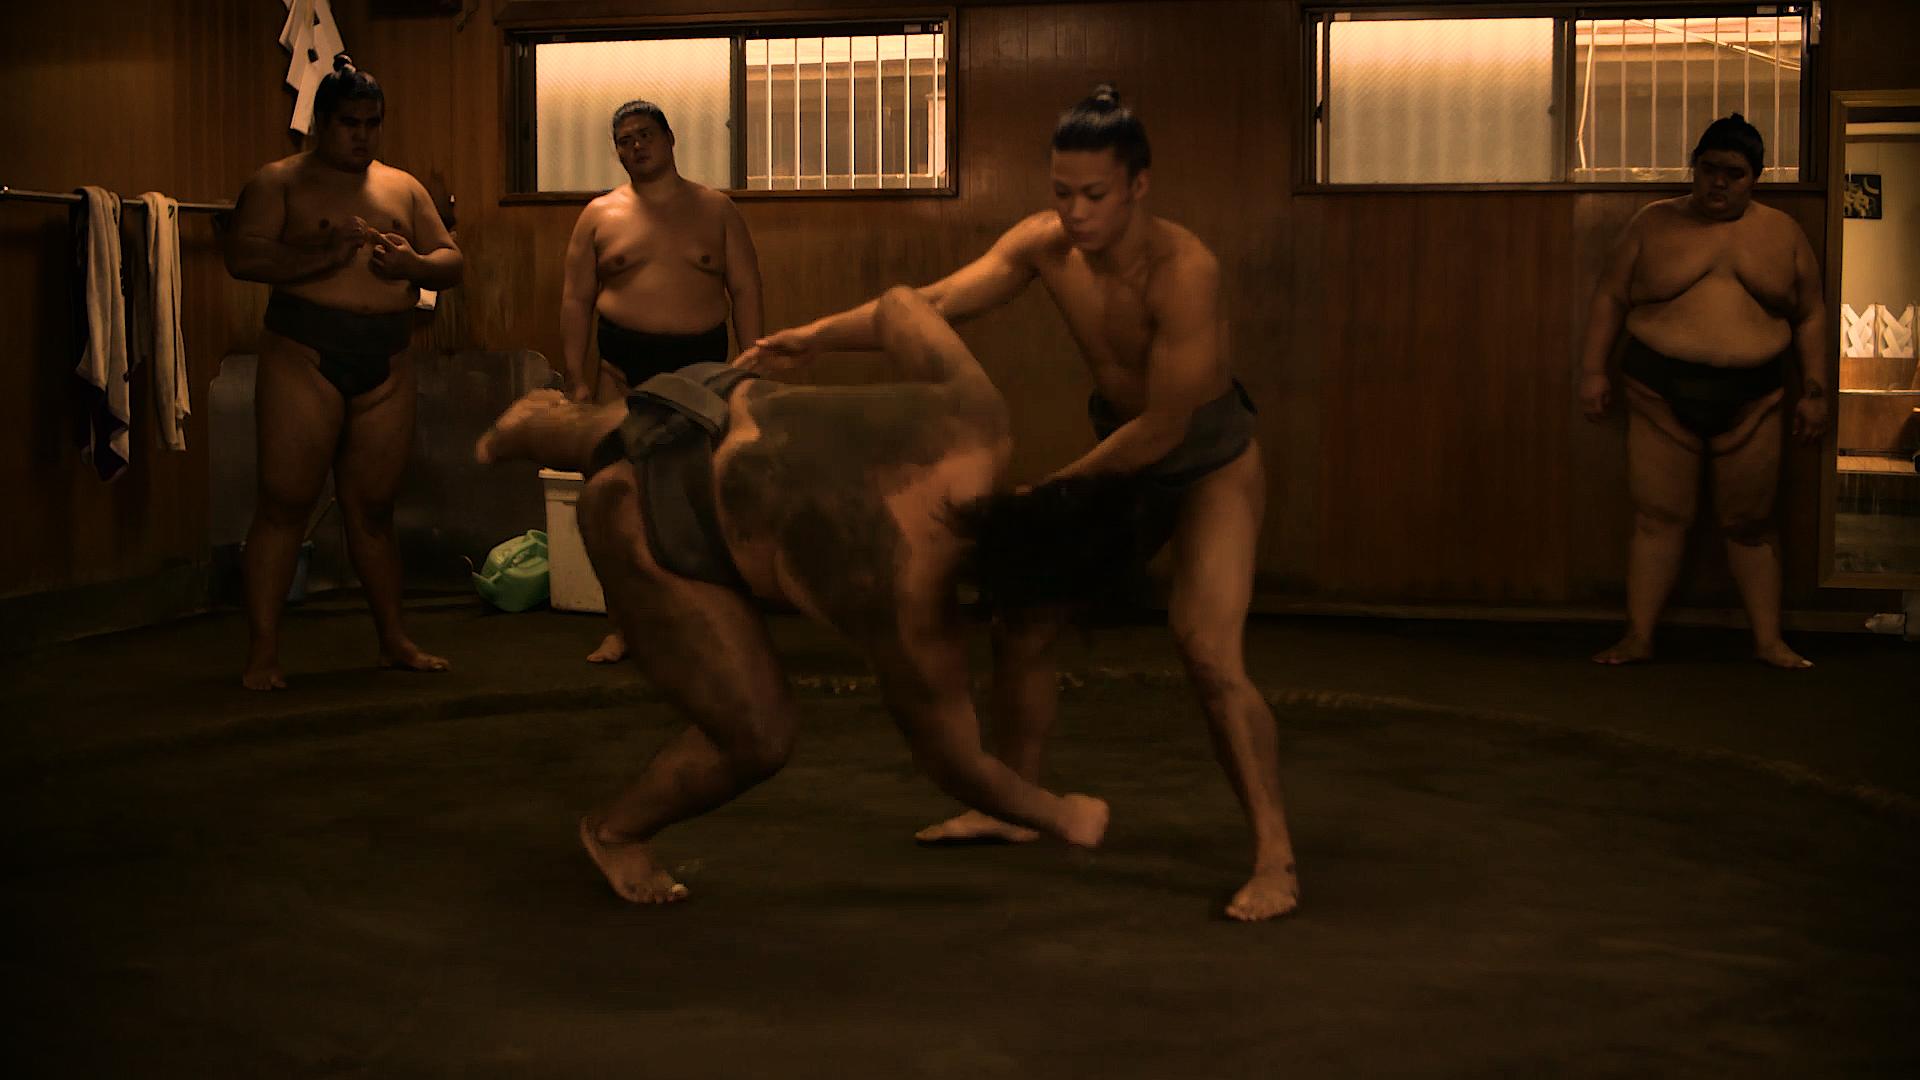 Sumos fighting, as one is thrown